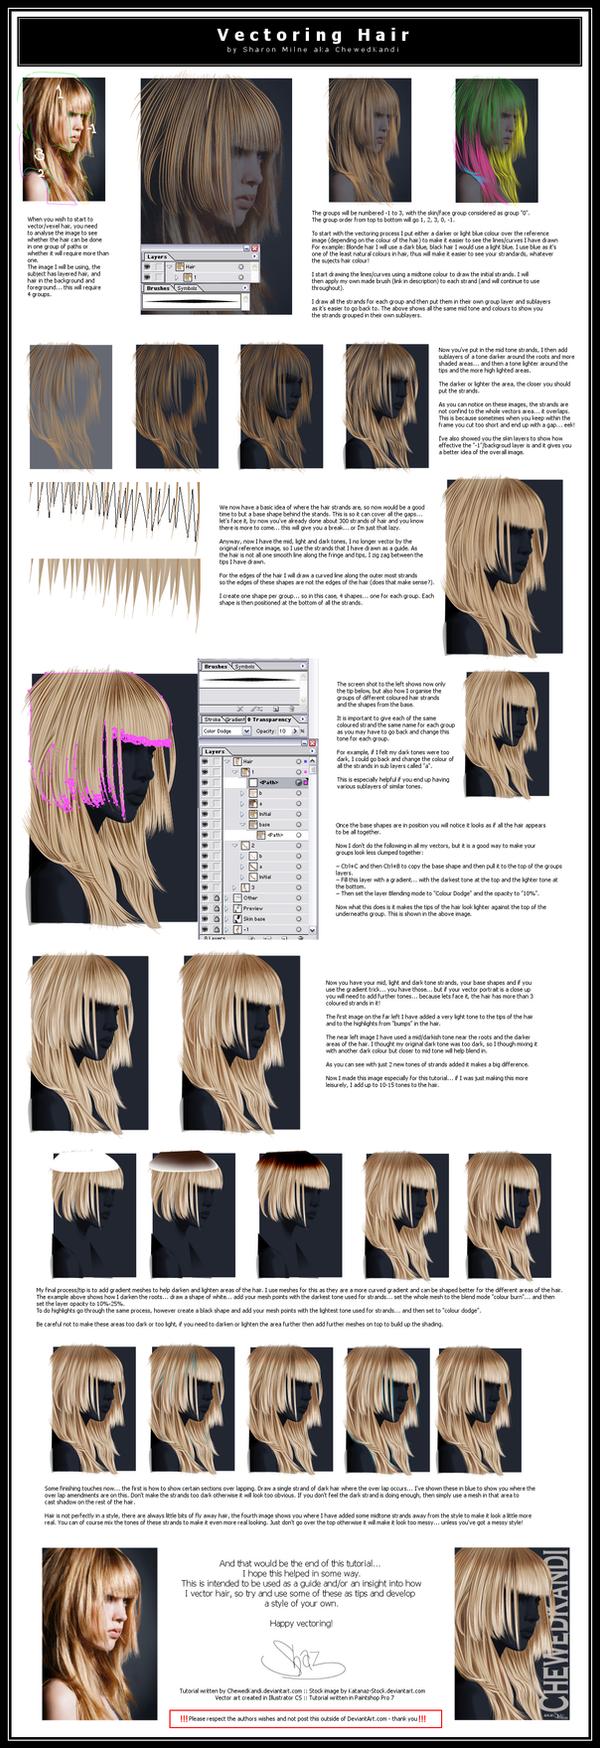 Vectoring Hair by ChewedKandi